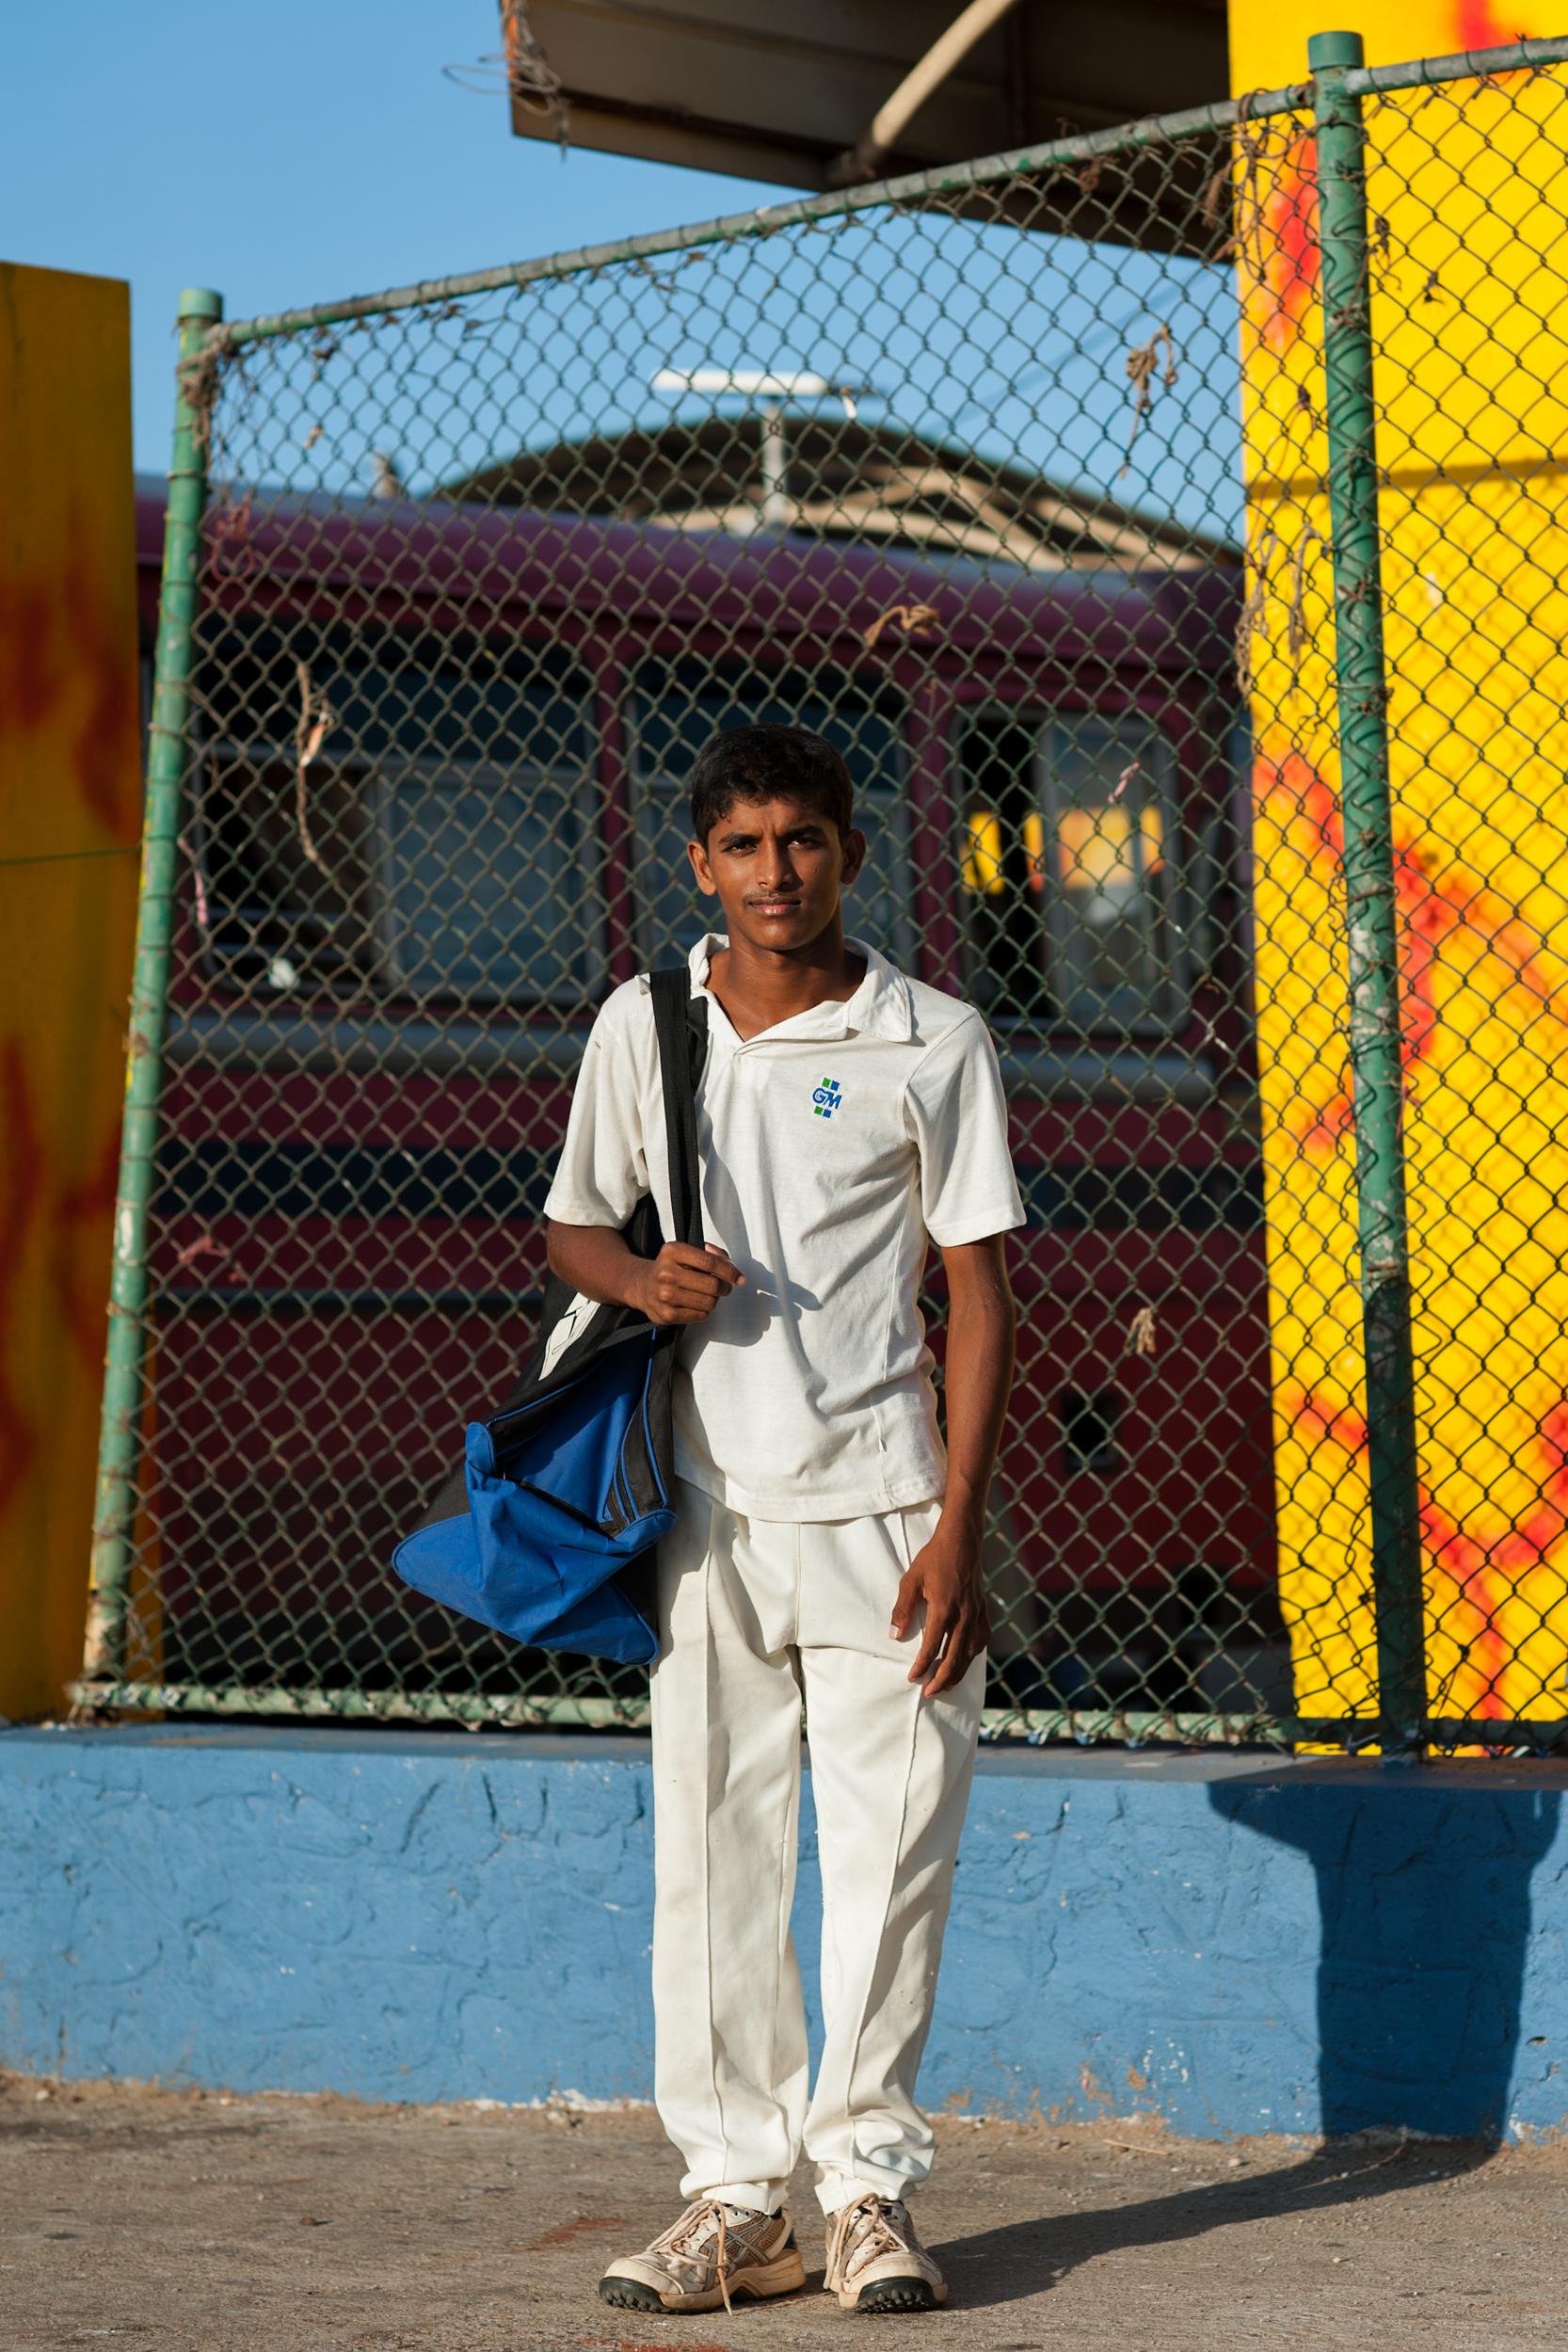 Cricketer, Trincomalee